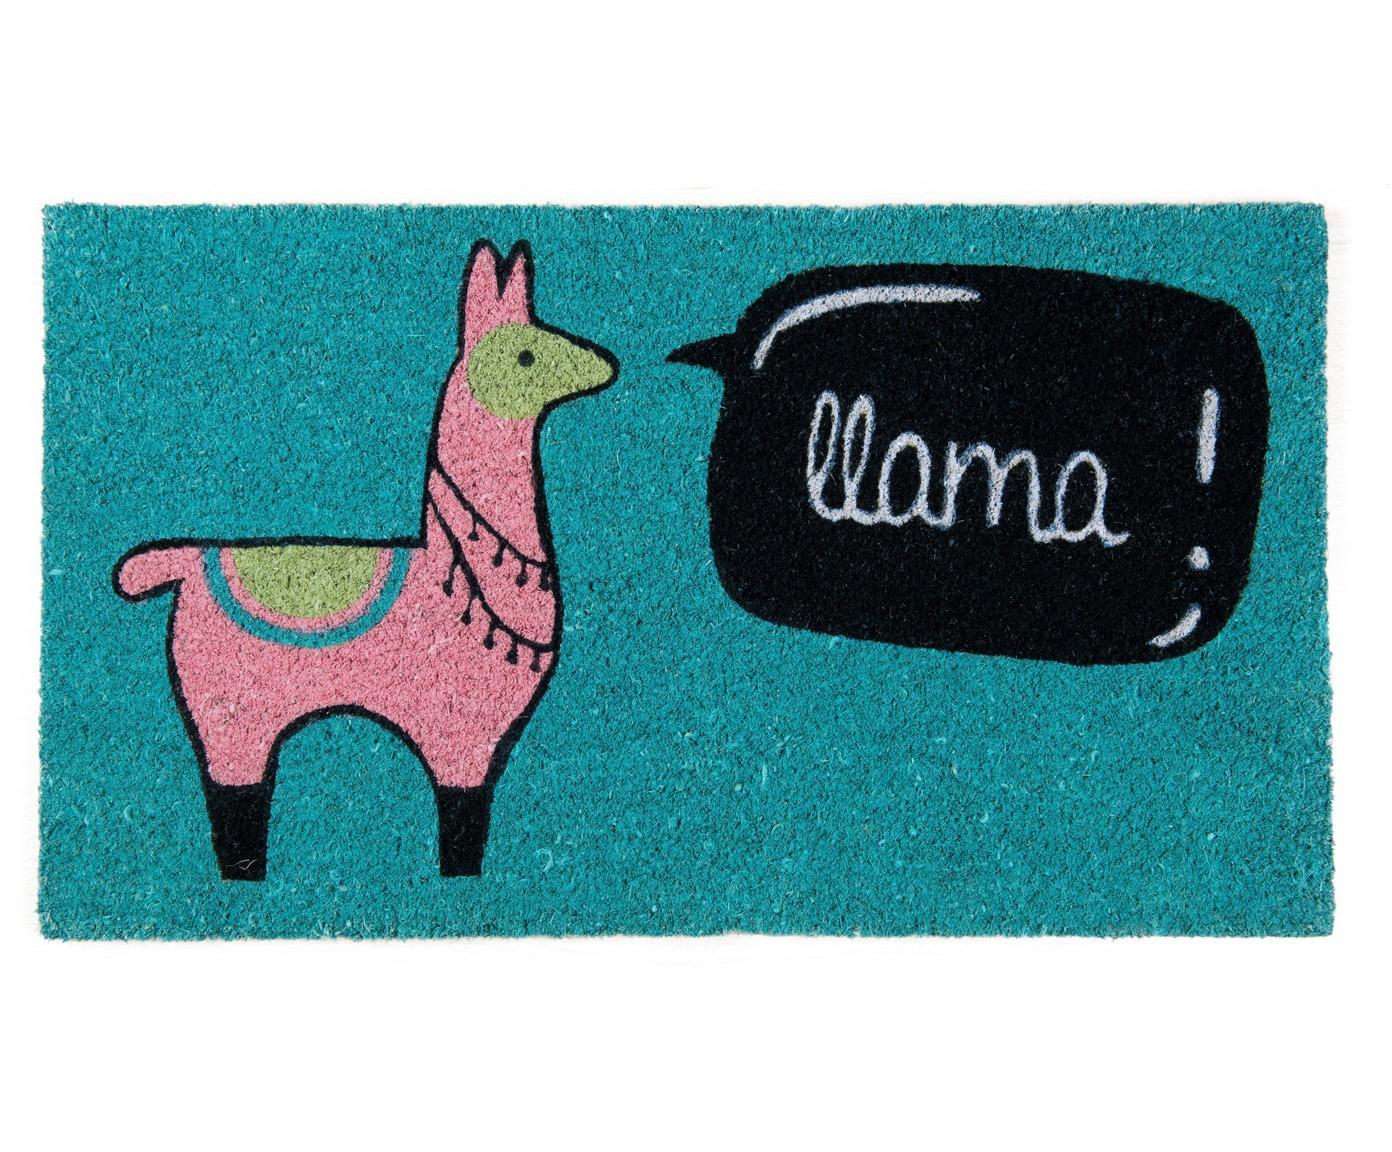 Zerbino in cocco Llama, Fibra di cocco, Blu, rosa, nero, beige, bianco, Larg. 40 x Lung. 70 cm